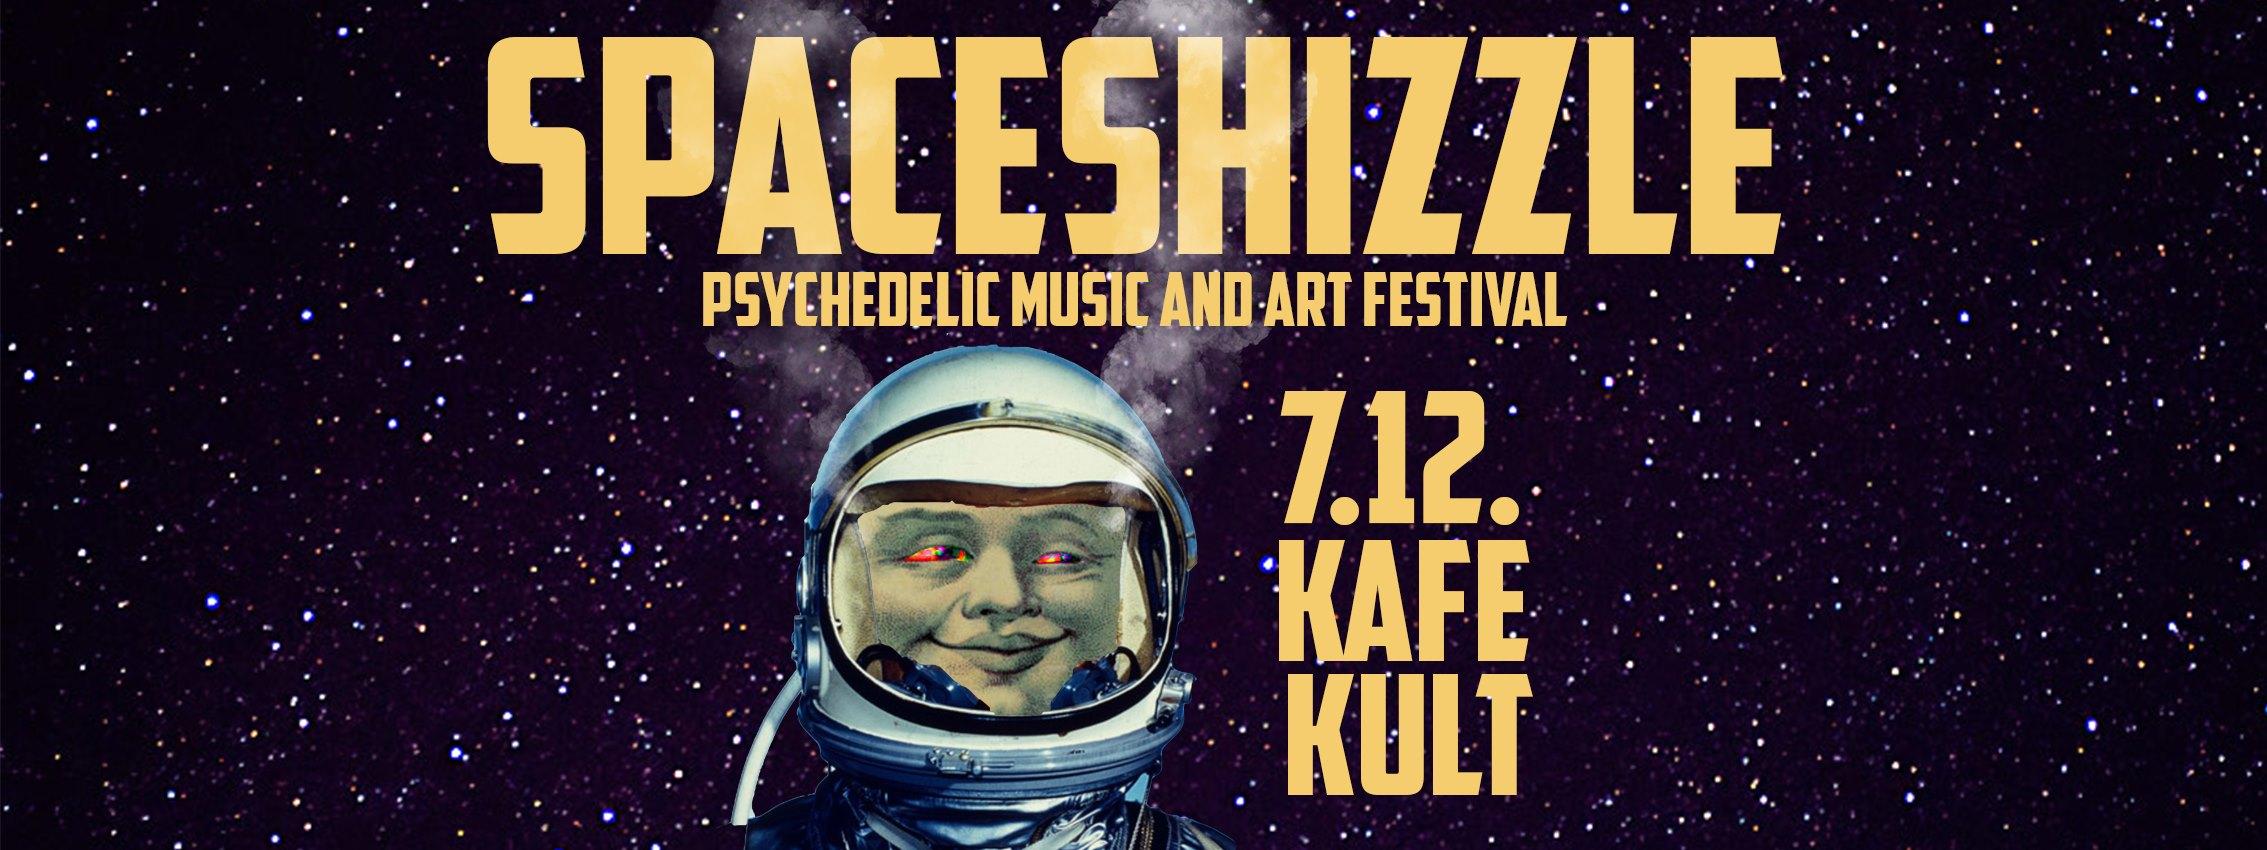 Spaceshizzle: P.F.s NEKROPOLIS + KYOTO KYOTO + SPACE JAM UNIT